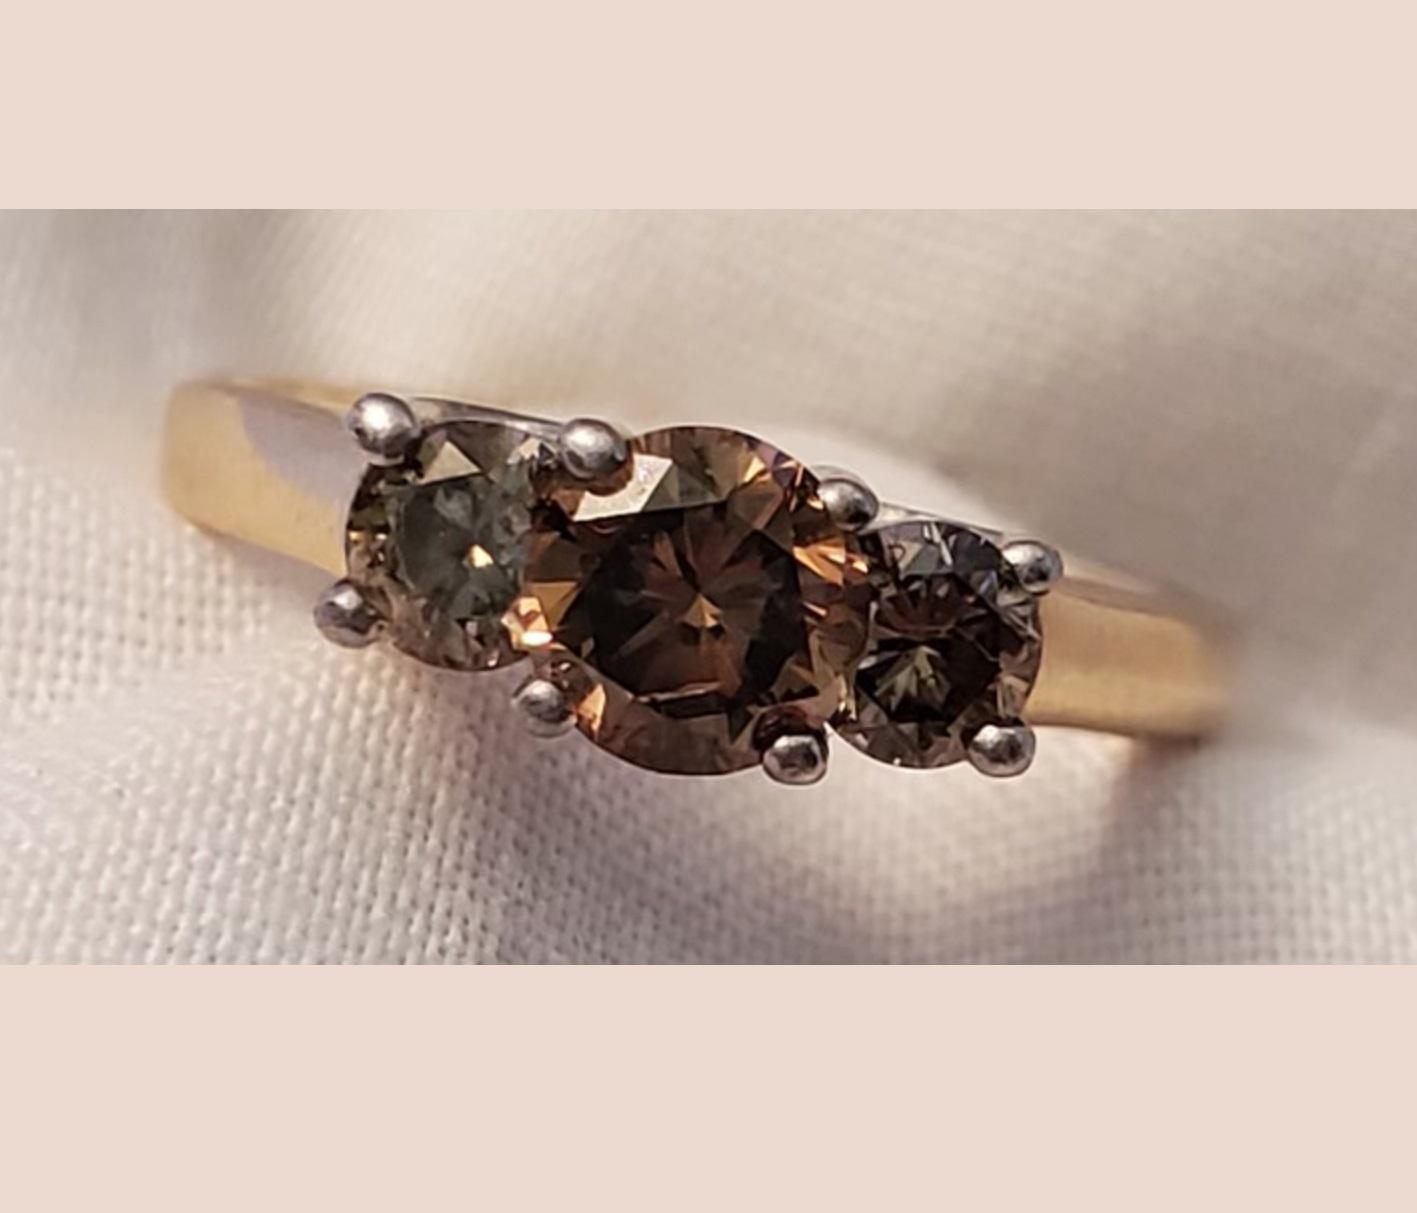 Lady's 0.67ct Fancy Intense Yellowish Brown Diamond Ring